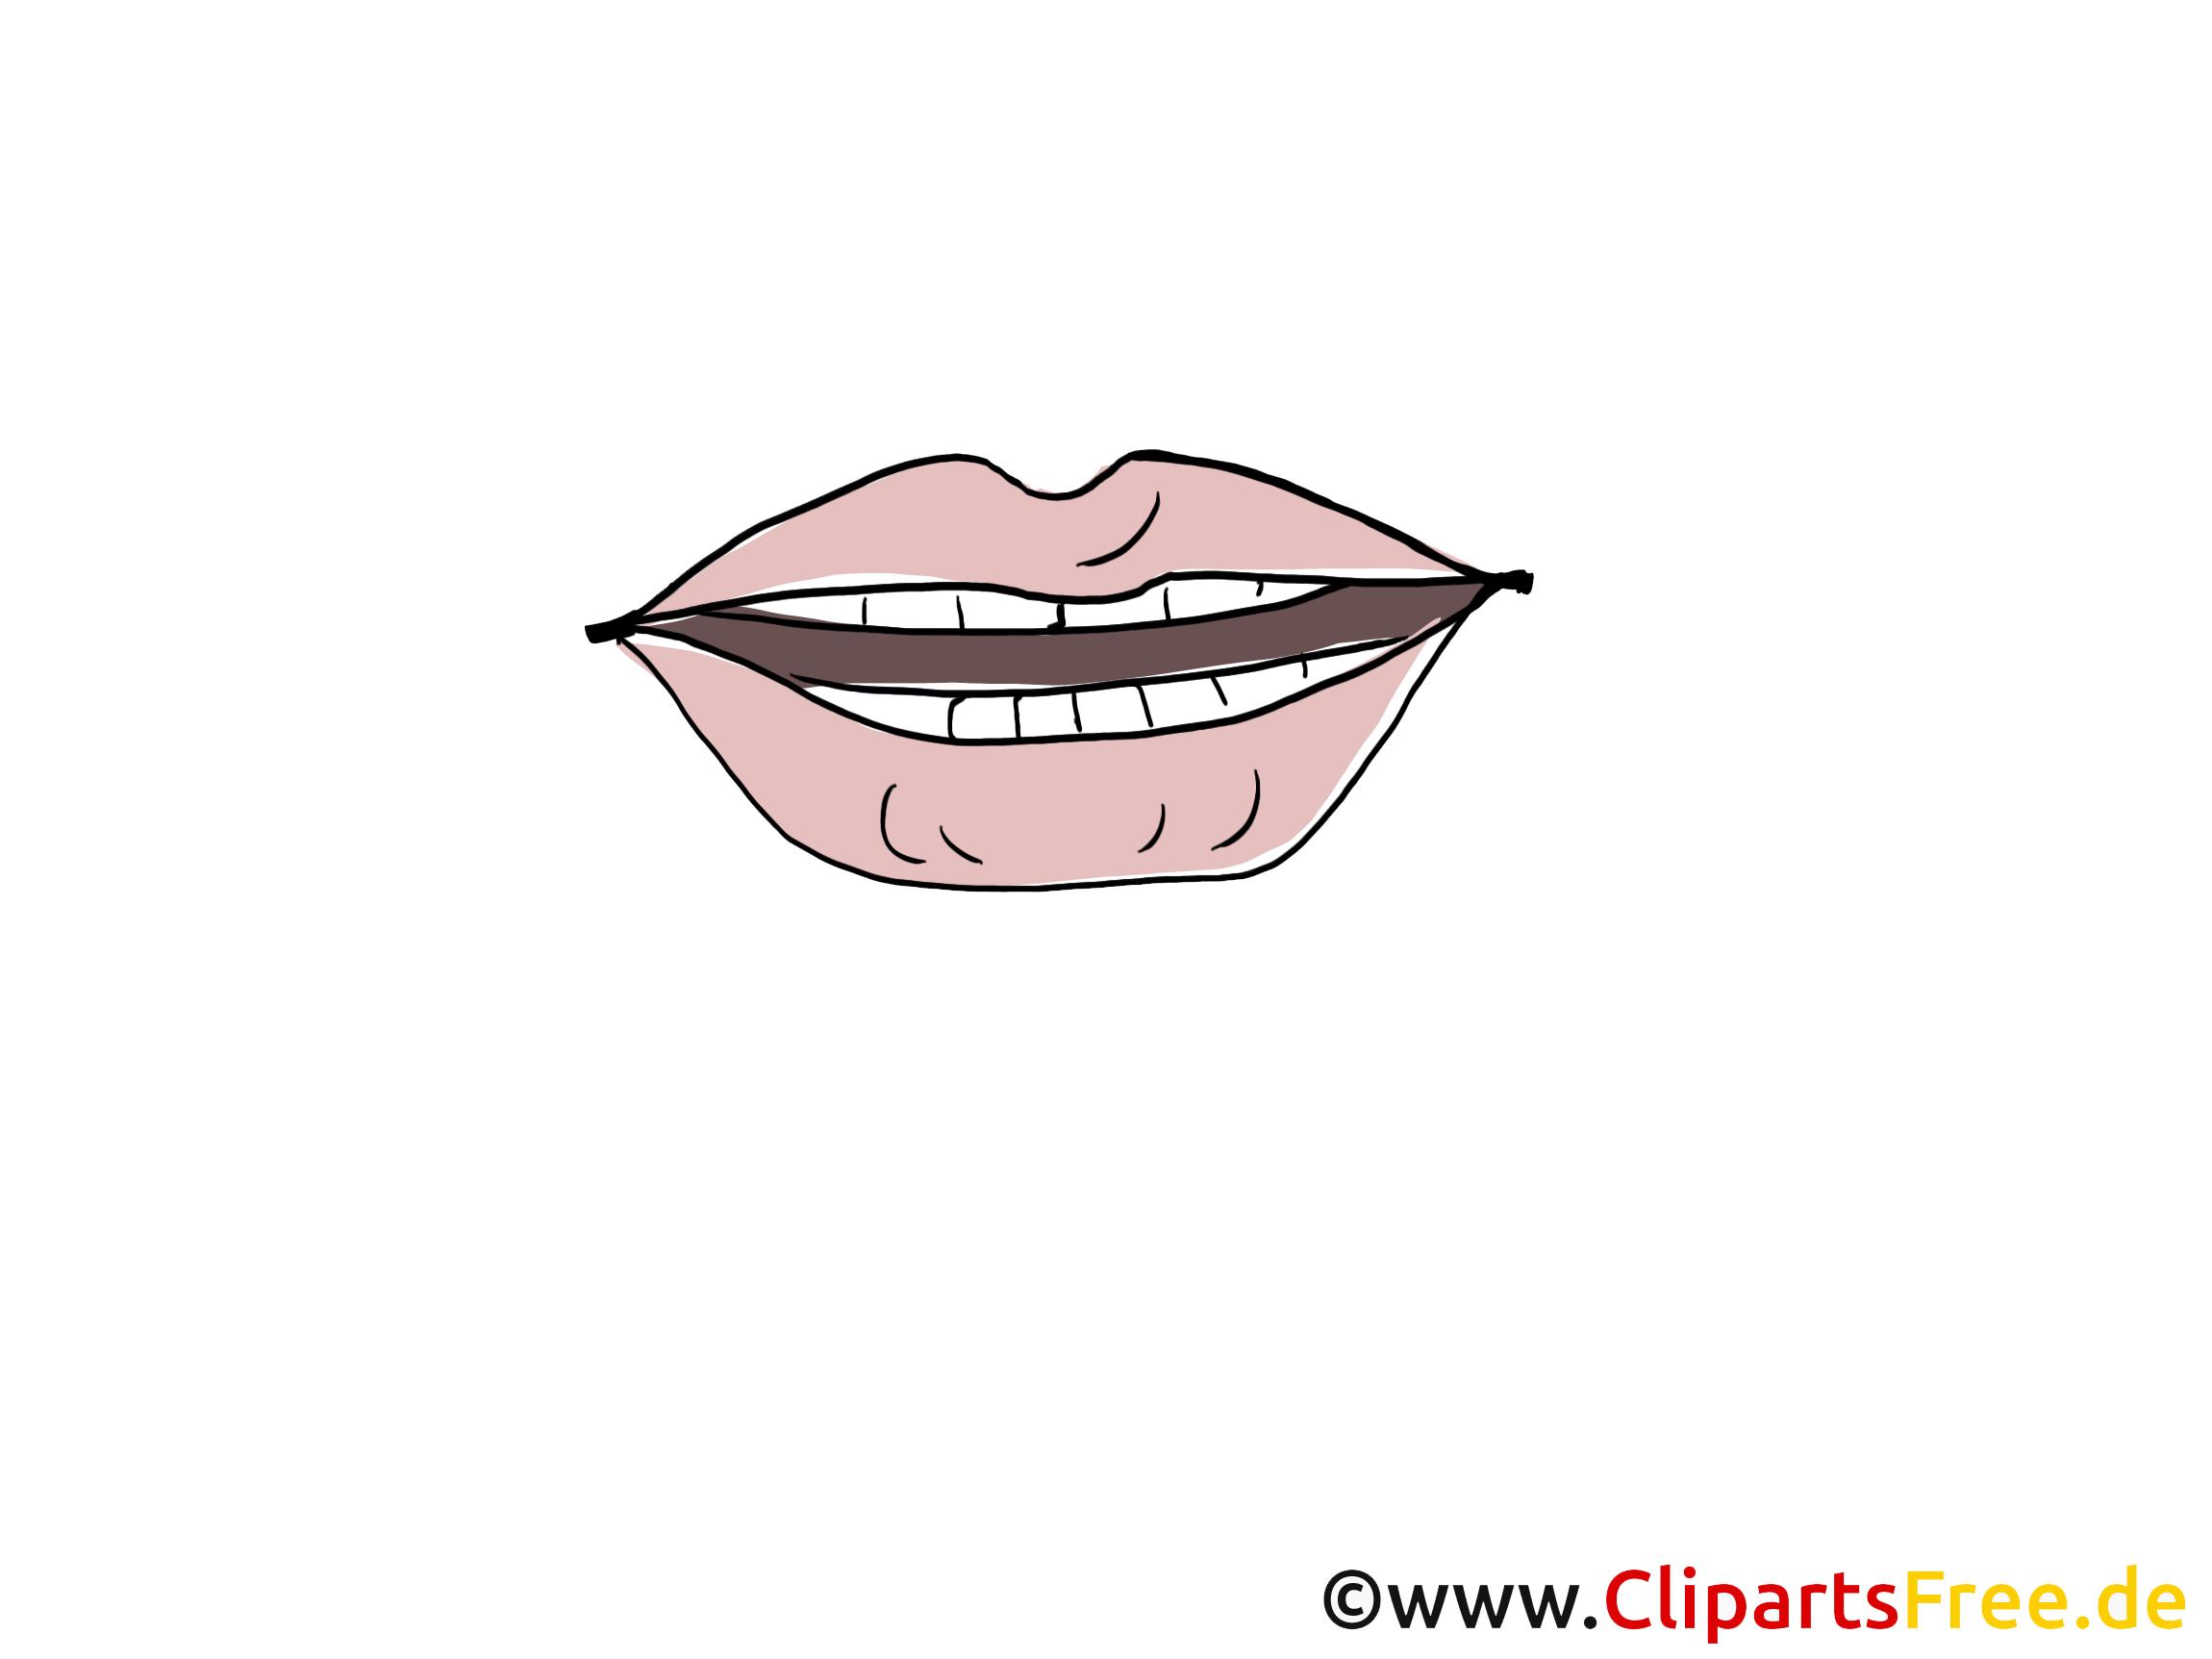 Bouche clip arts gratuits – Dessin illustrations